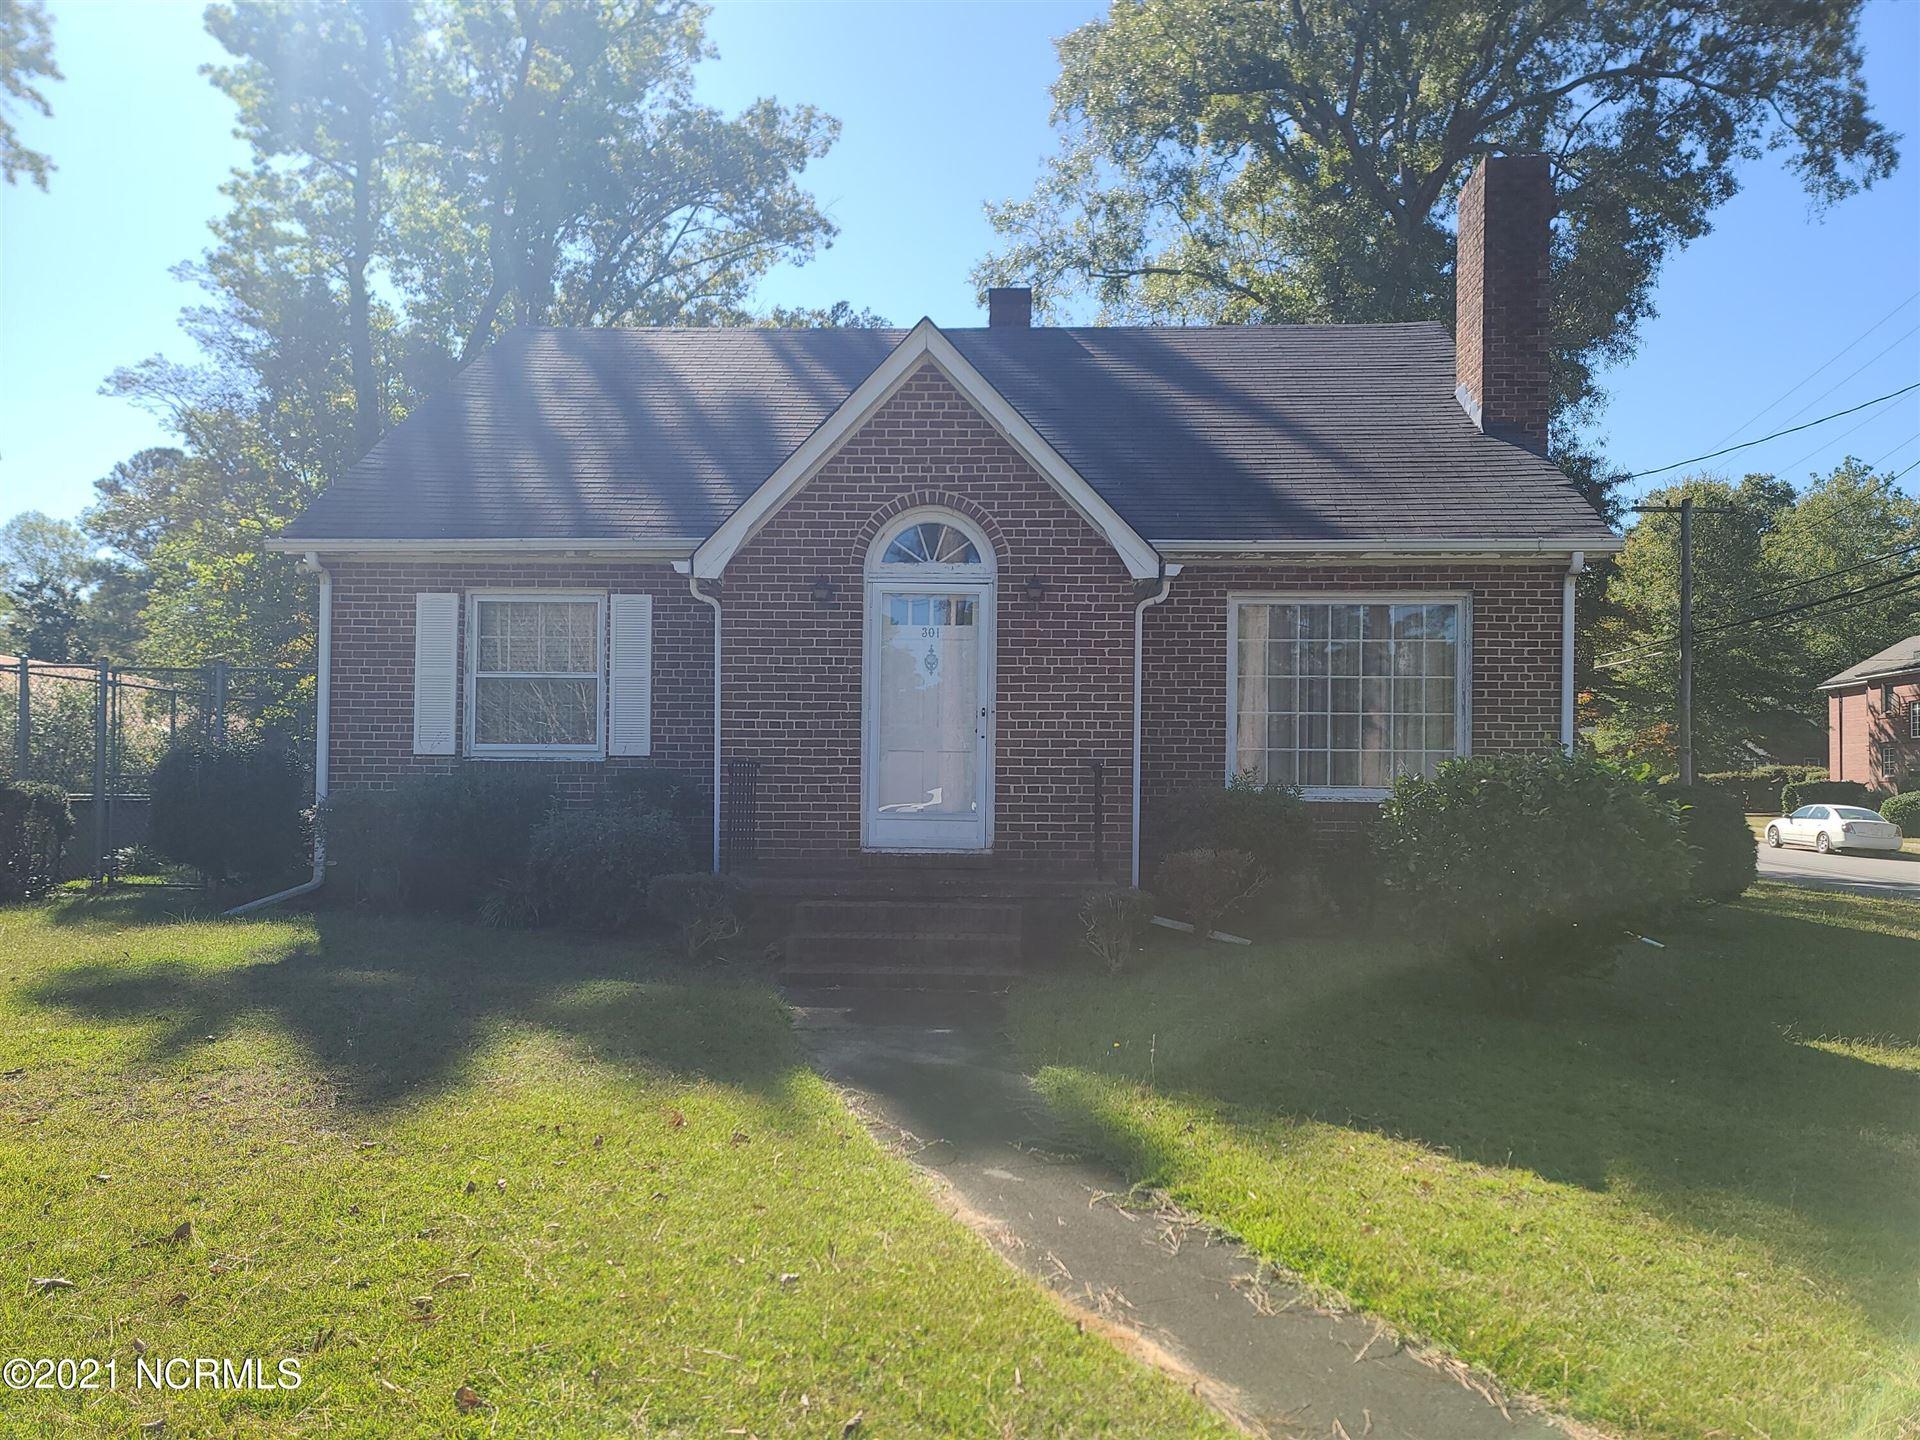 Photo of 301 Woodlawn Drive, Kinston, NC 28501 (MLS # 100295871)